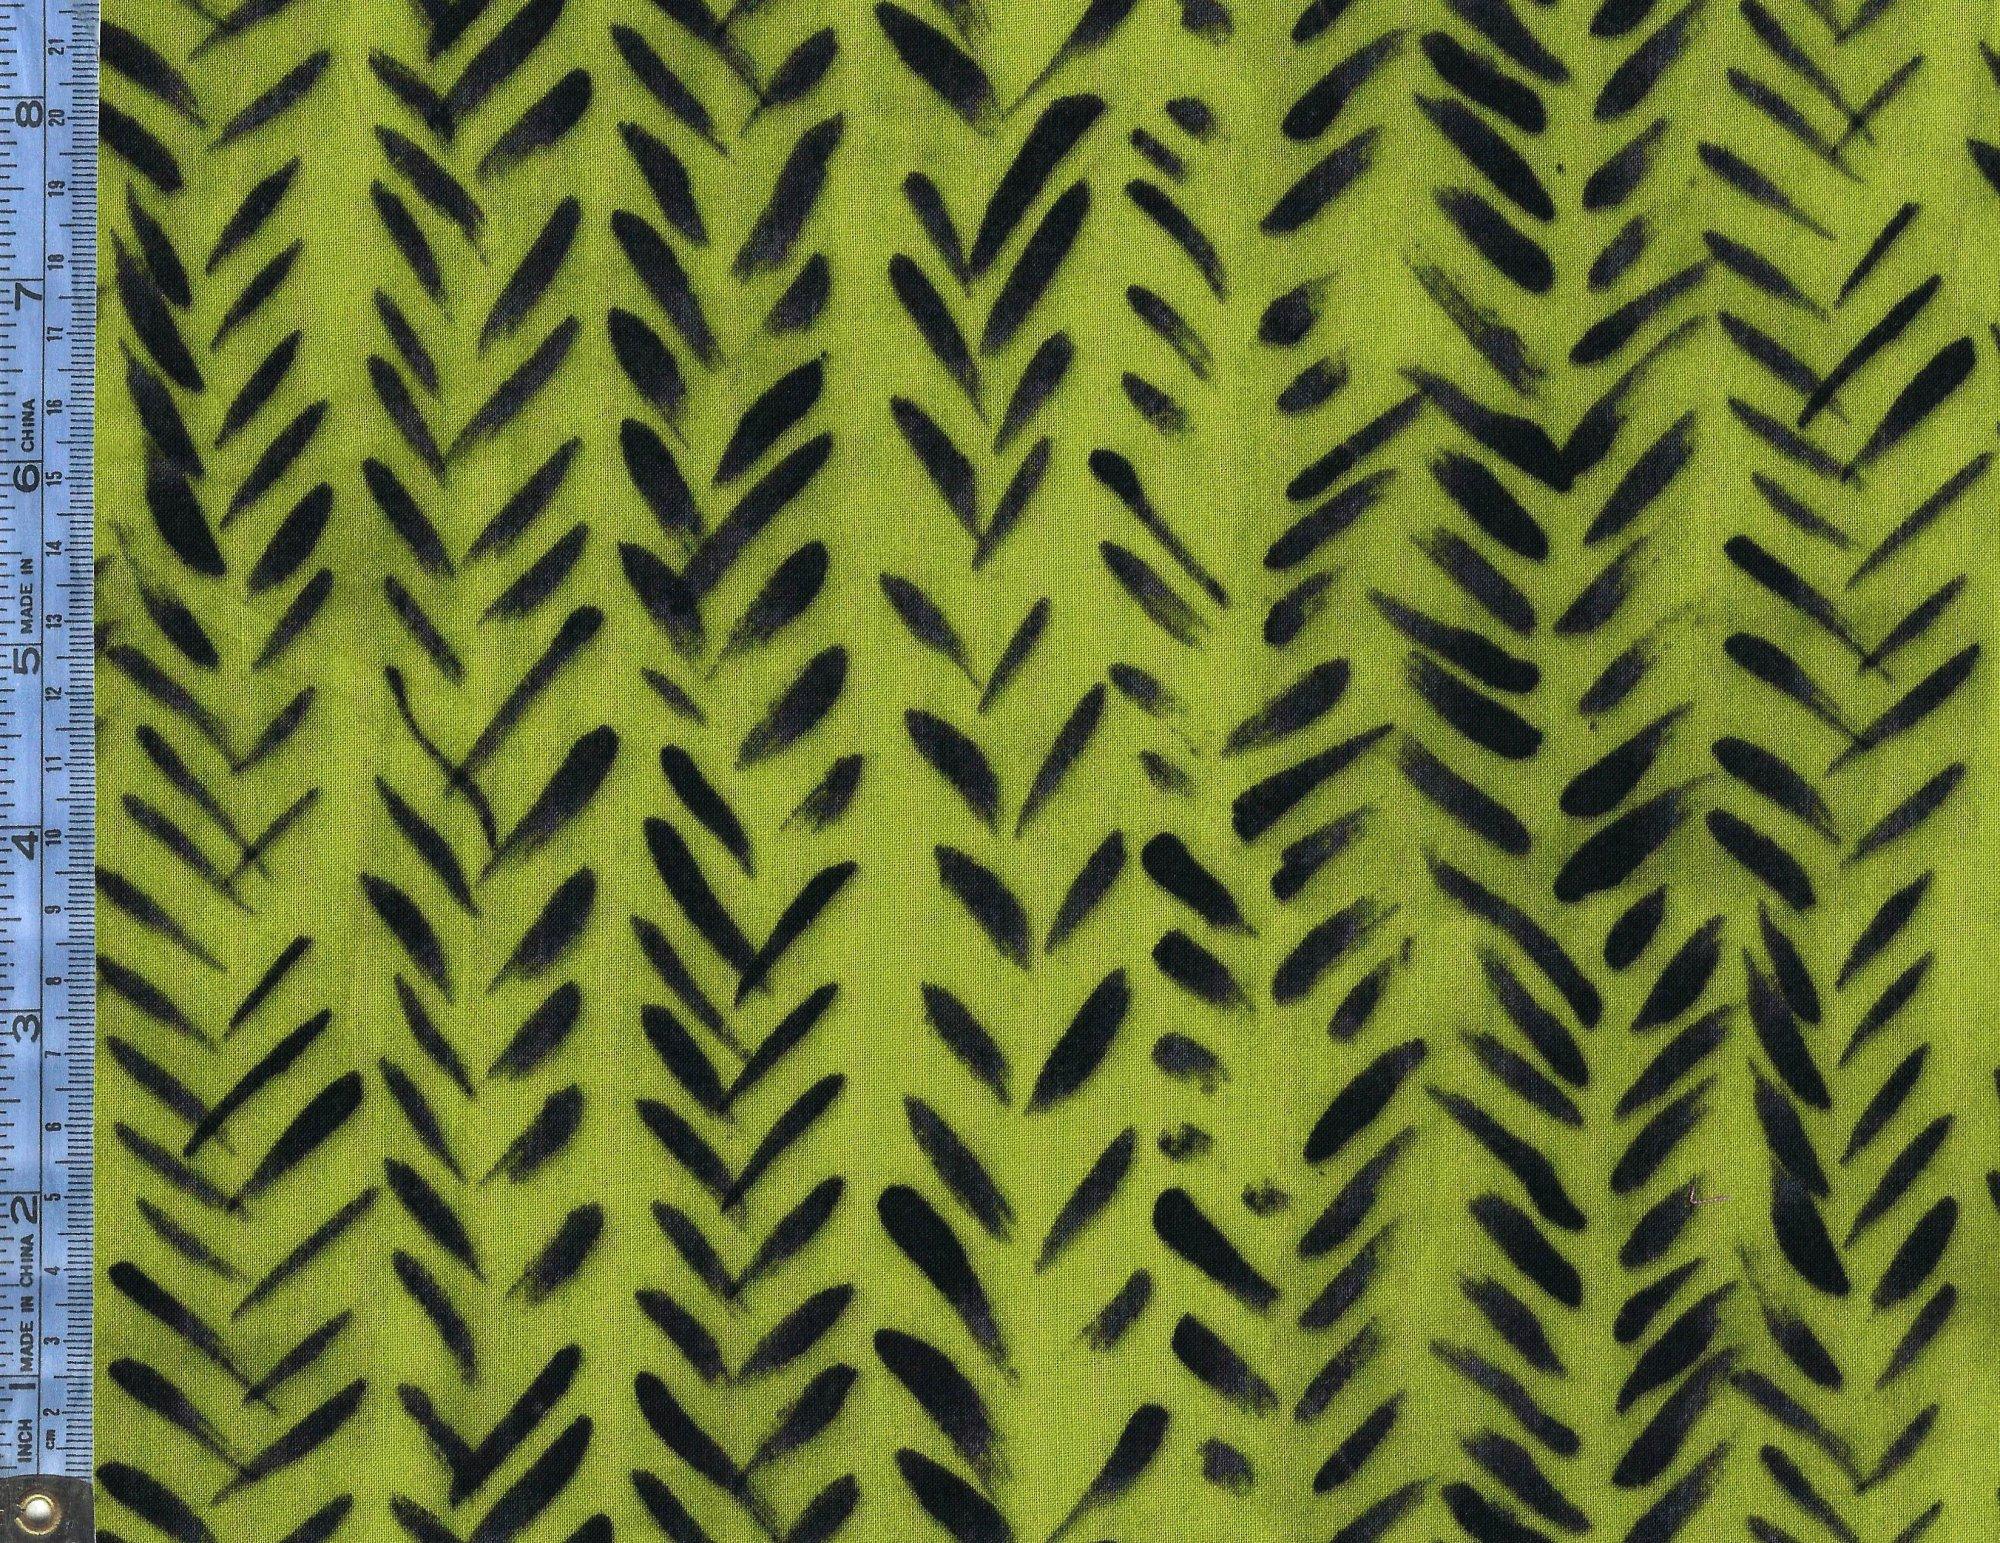 Treasure Hunt - (43190-18) black slash-marks on lime green background